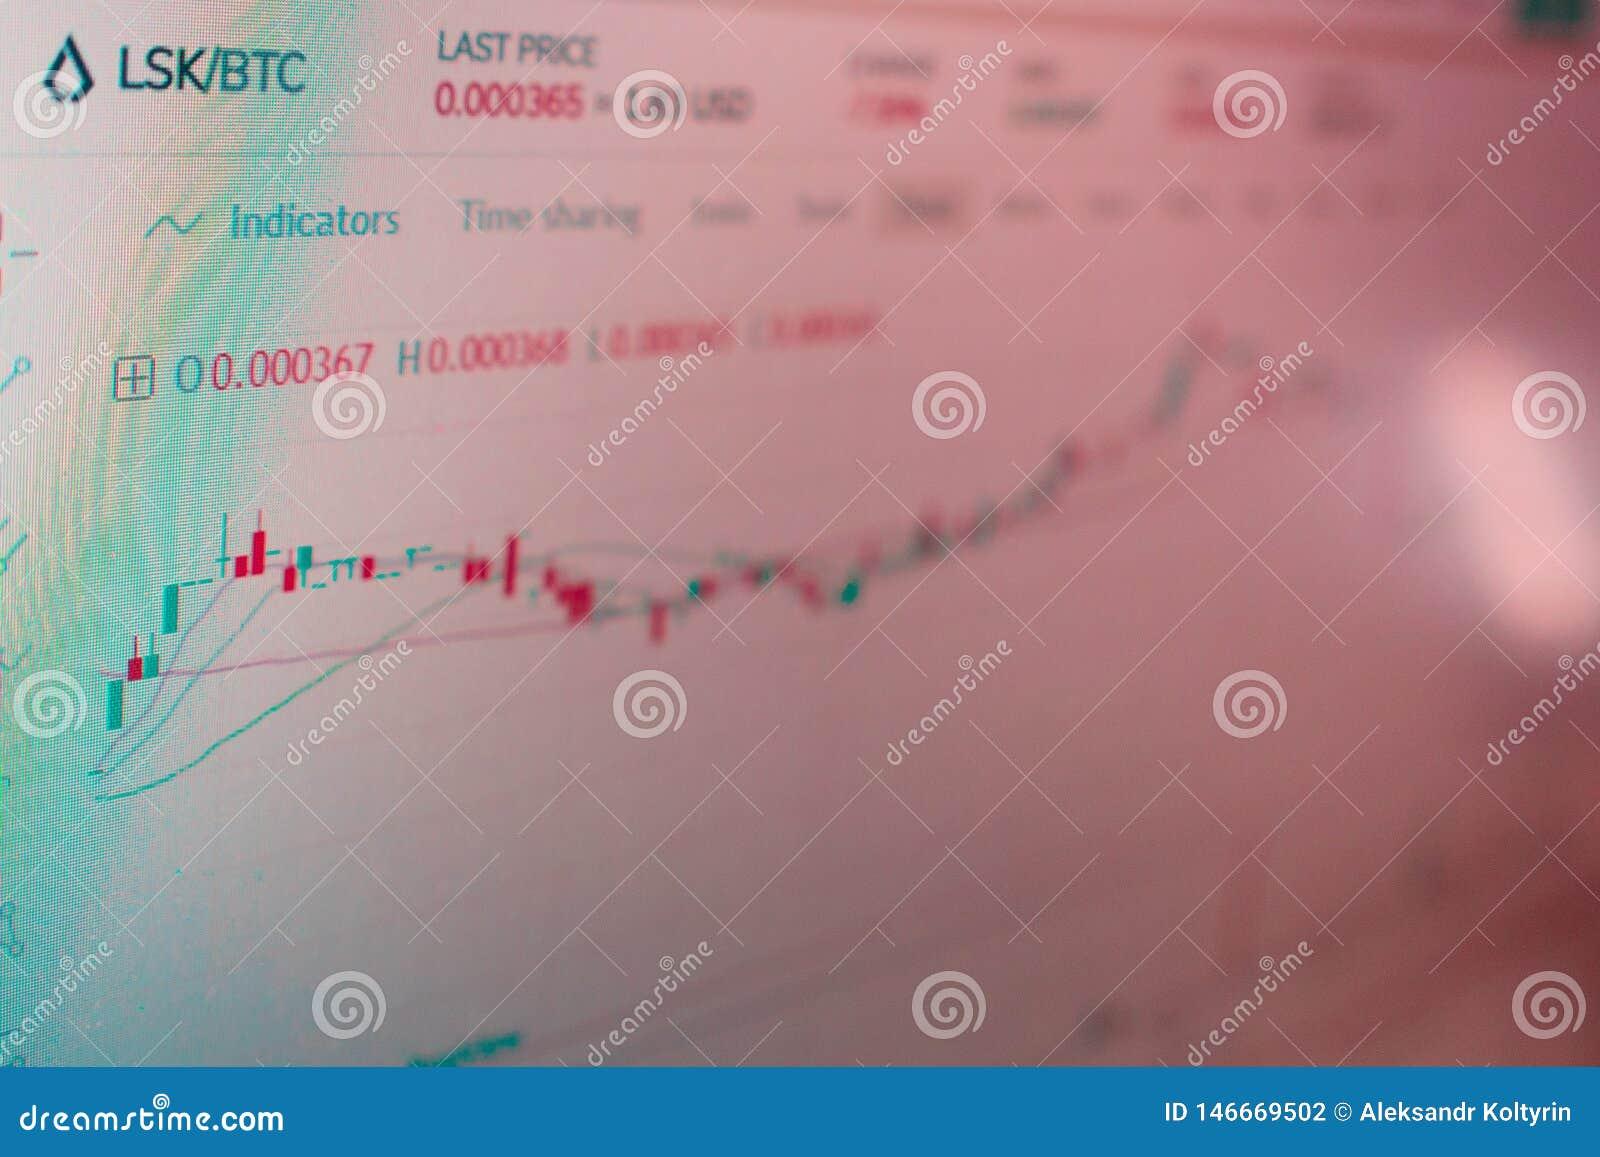 Lisk cryptocurrency贸易的应用接口 显示器的照片 cryptocurrencies的挥发性